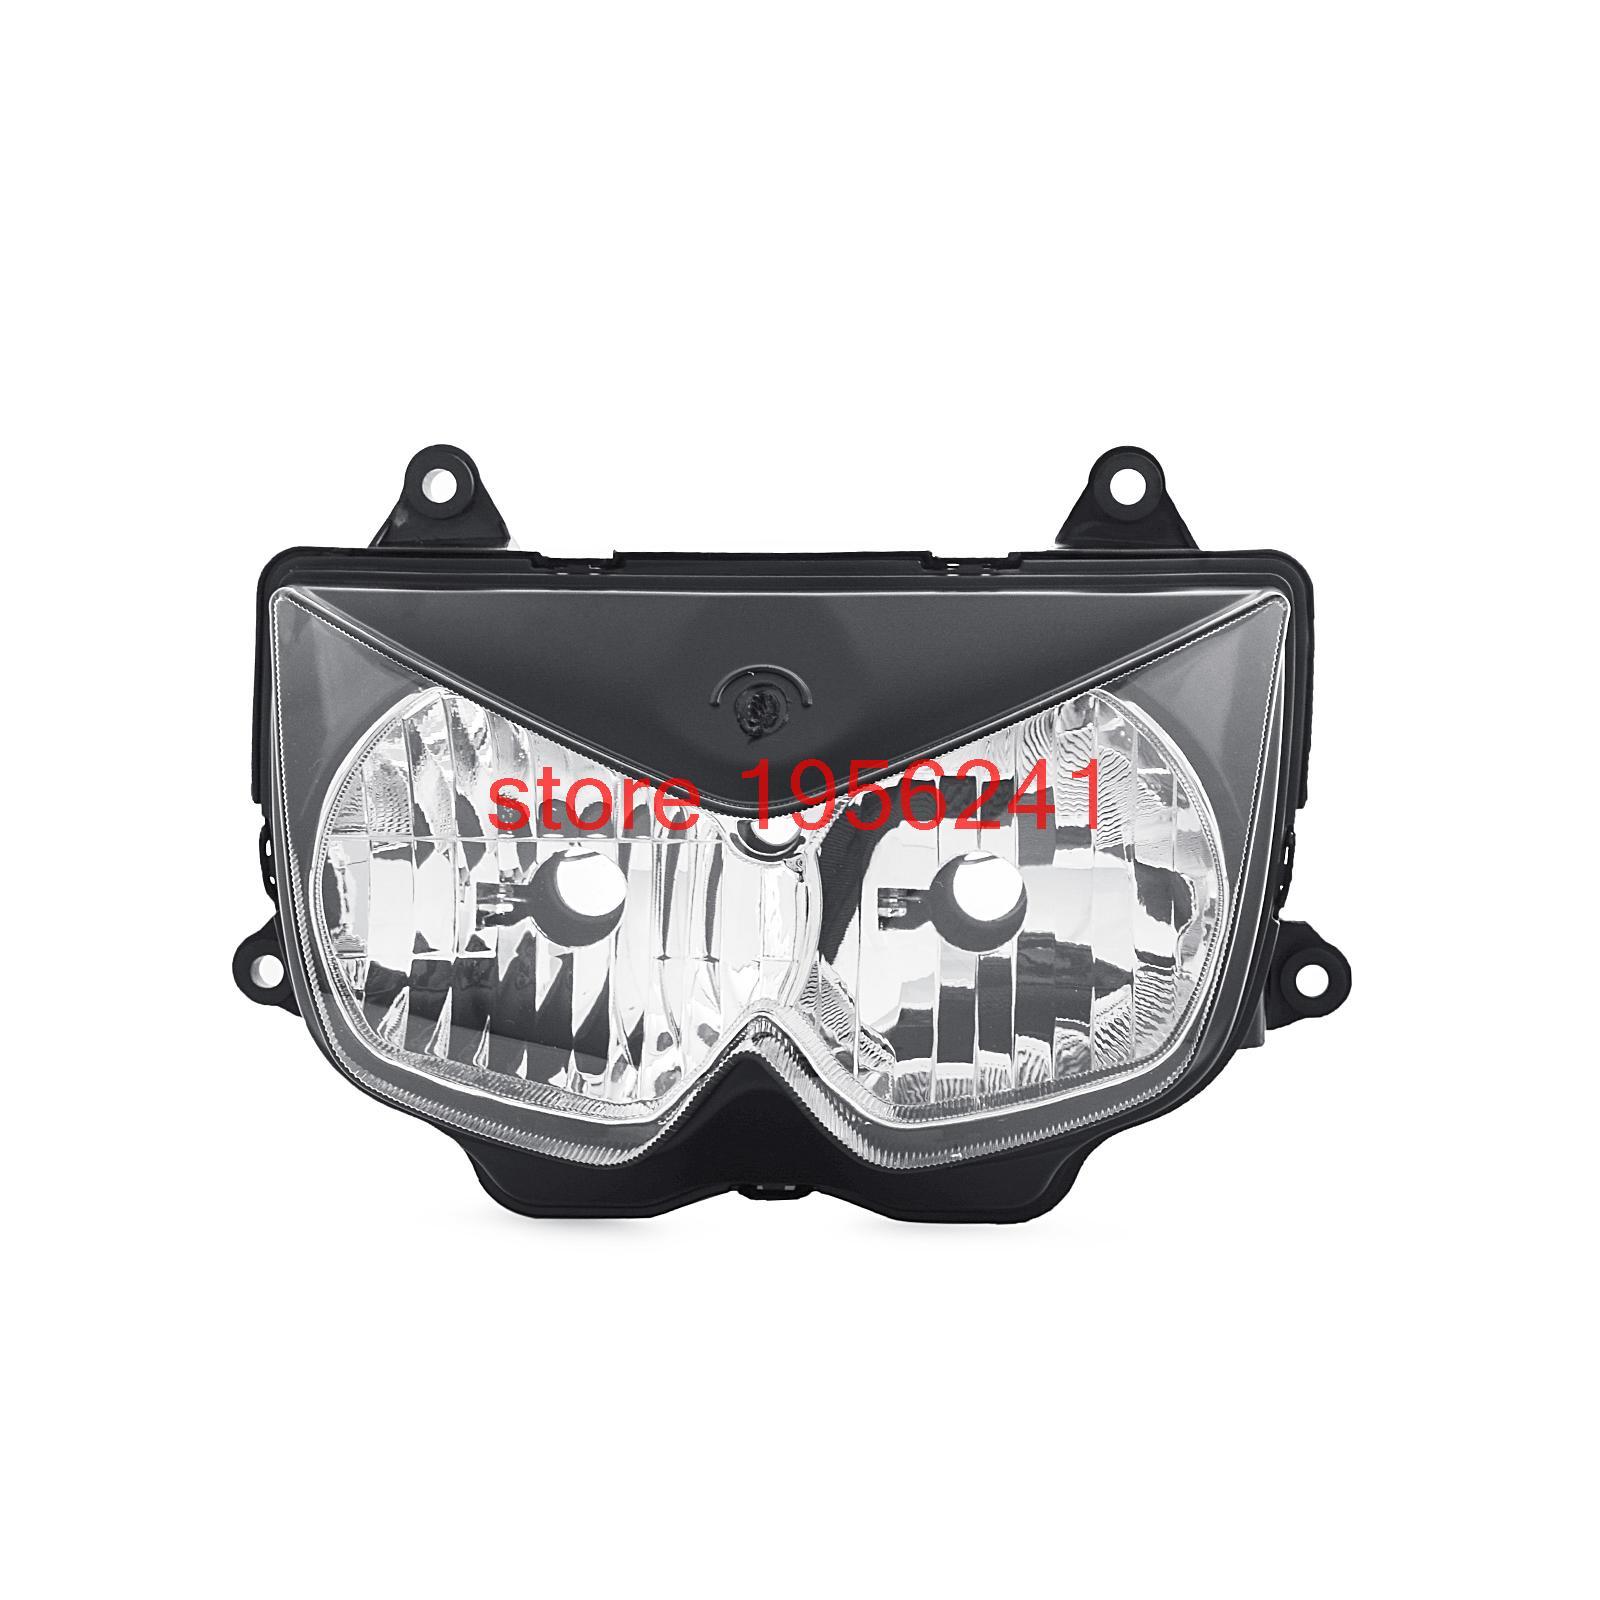 Motorcycle ABS Plastic Replacement Headlamp Headlight Kits For Kawasaki KLE500 2005 2006 2007 KLE 500 for kawasaki kle500 1991 2007 foldable extendable brake levers folding kle 500 92 93 94 95 96 97 98 99 00 01 02 03 04 05 2006